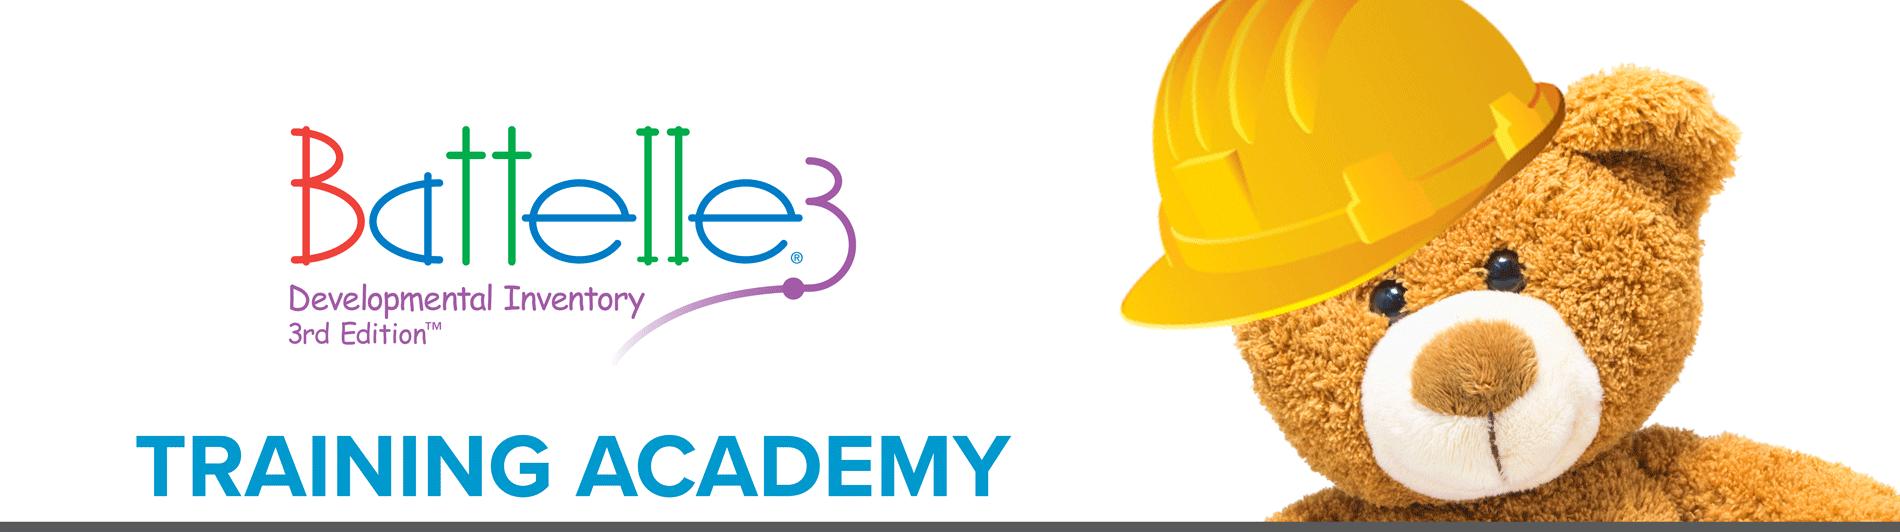 BDI-3-Training-Academy-Web-banner_v2-1900x532